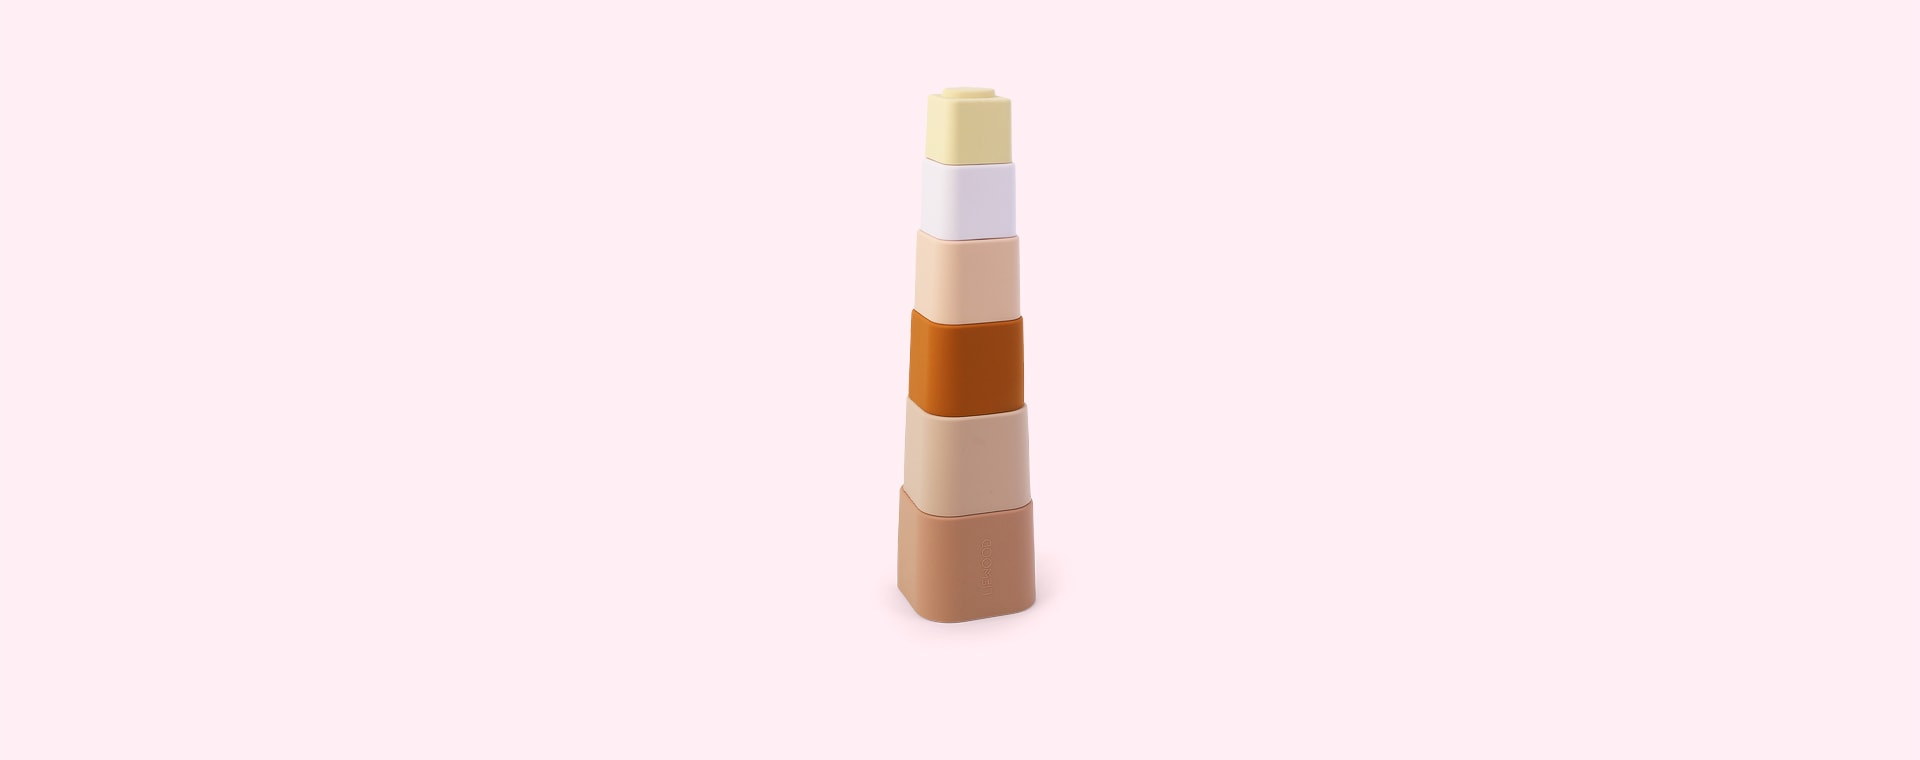 Rose Multi Mix Liewood Zuzu Stacking Cups